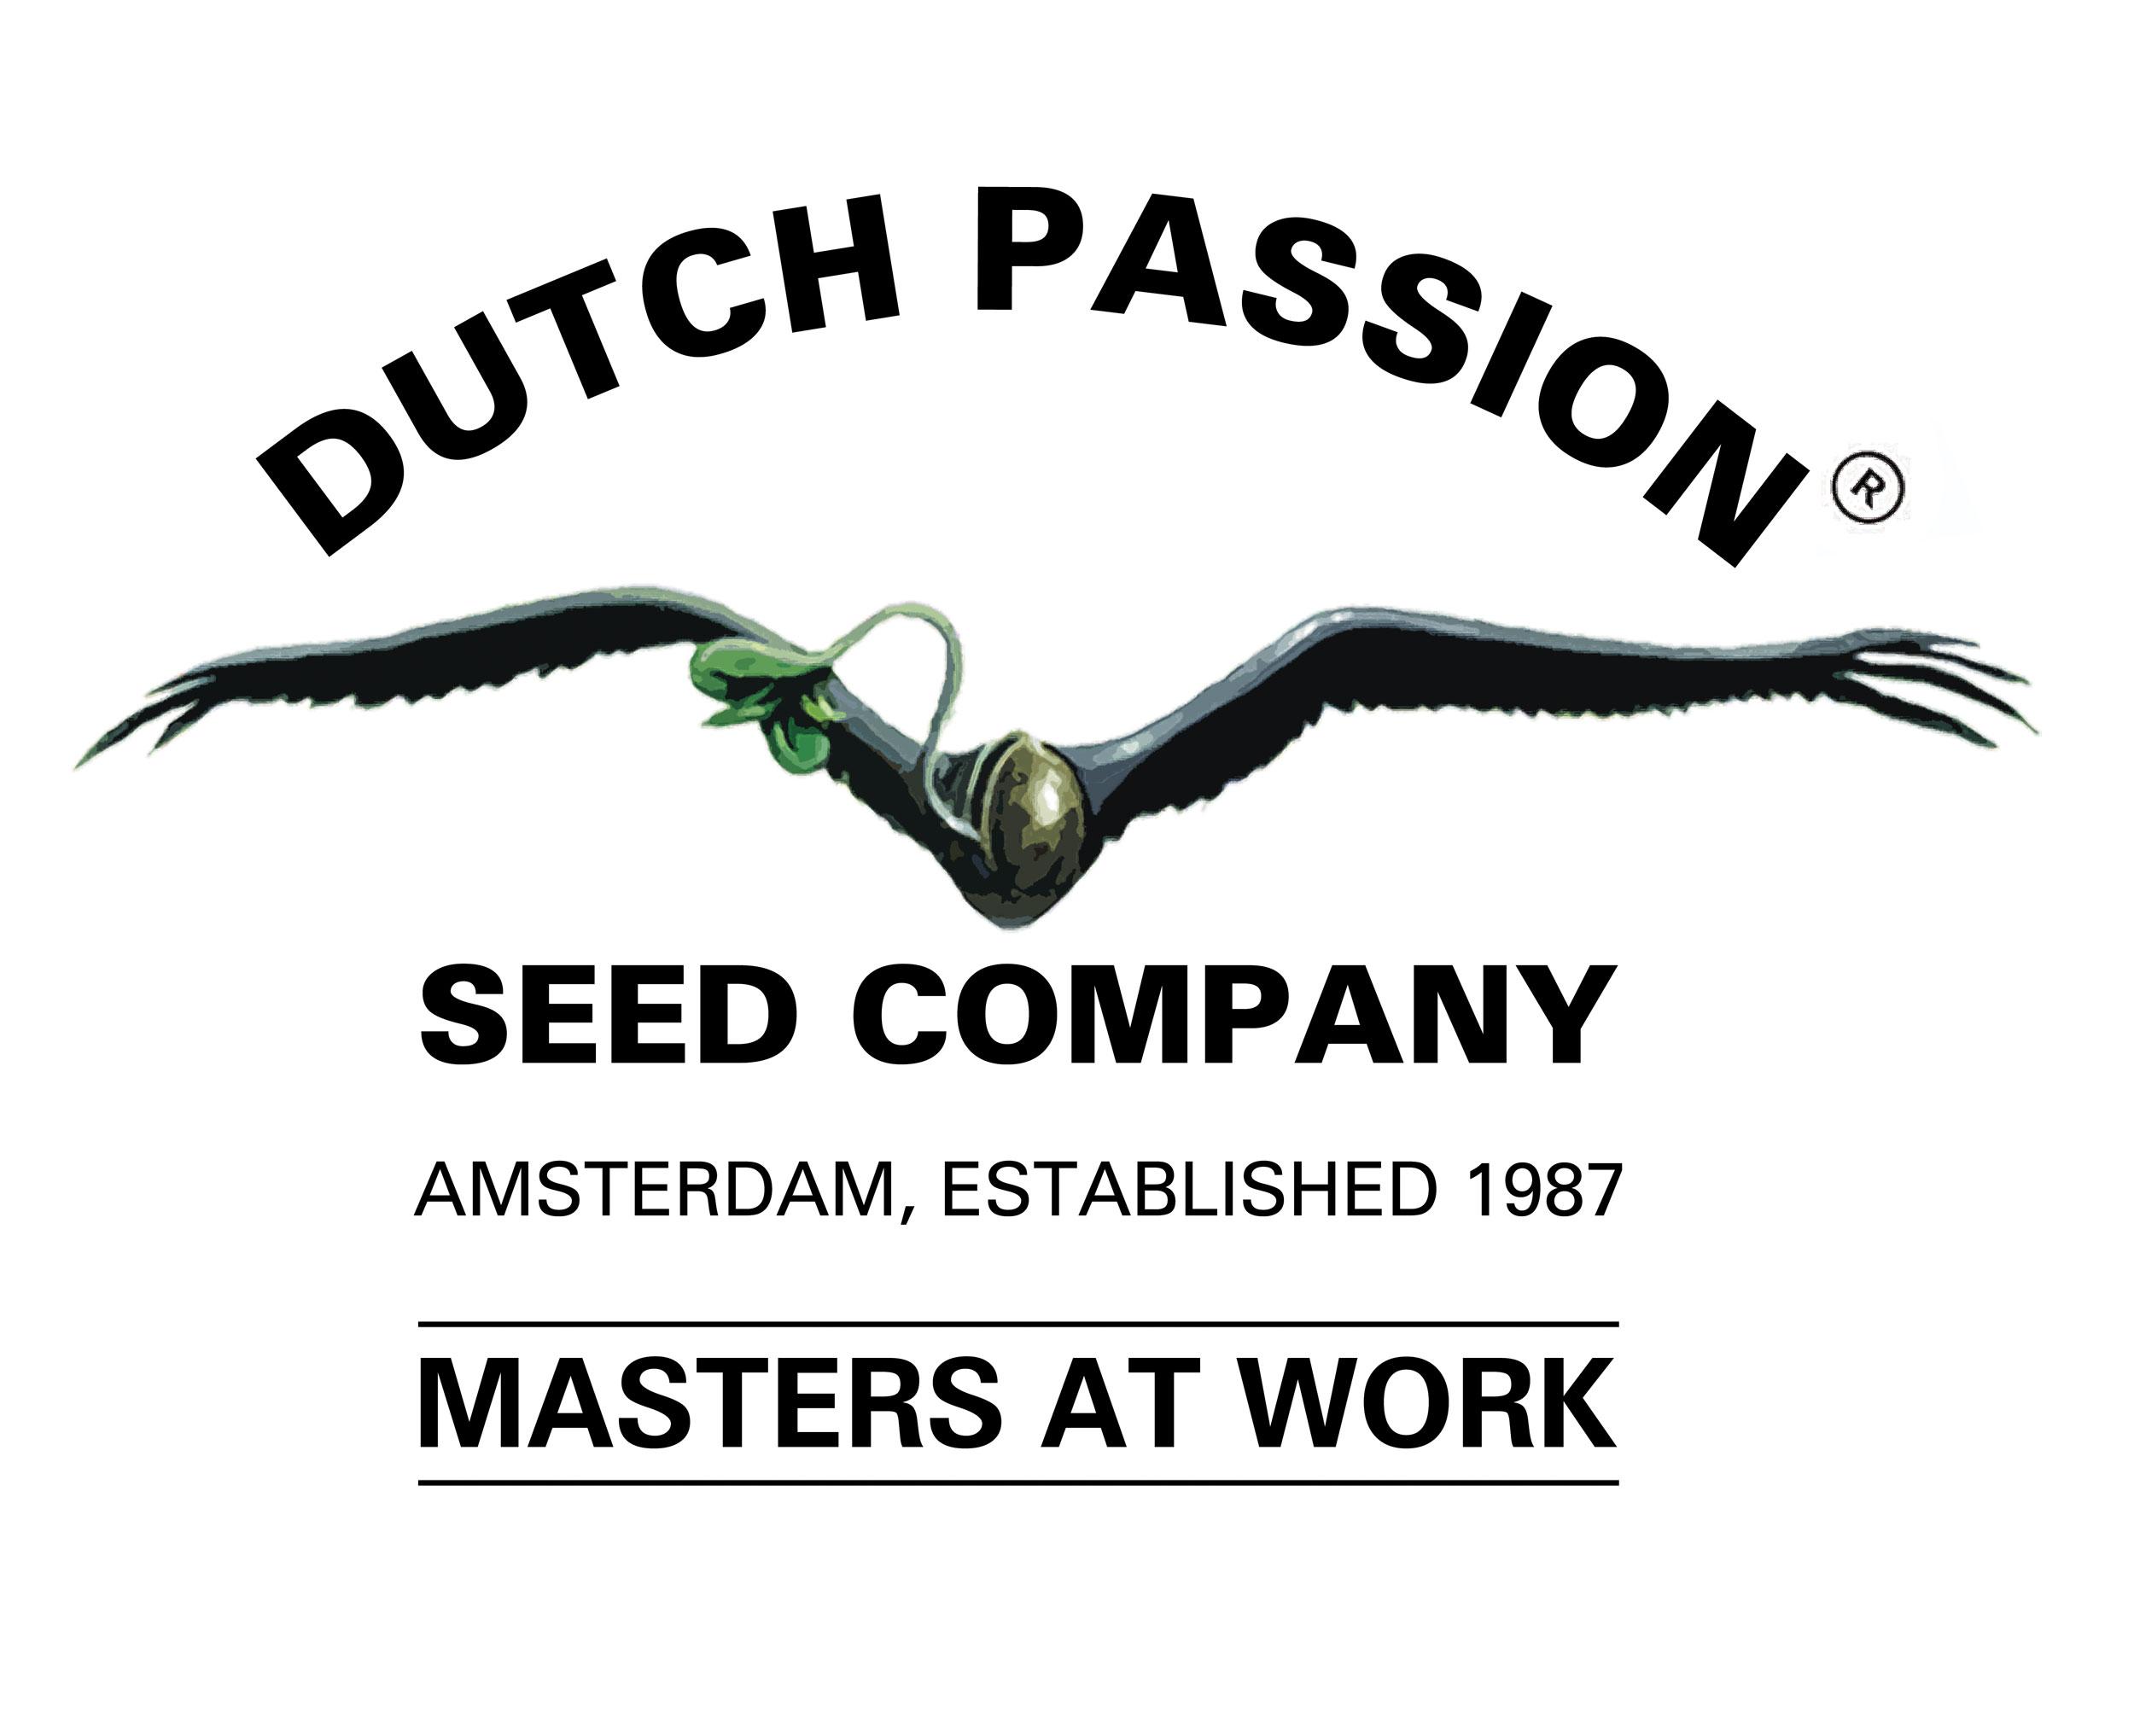 Dutch Passion CBD Auto Compassion Lime feminizovaná auto 3ks (Autoflowering feminizovaná semena s větším obsahem CBD)